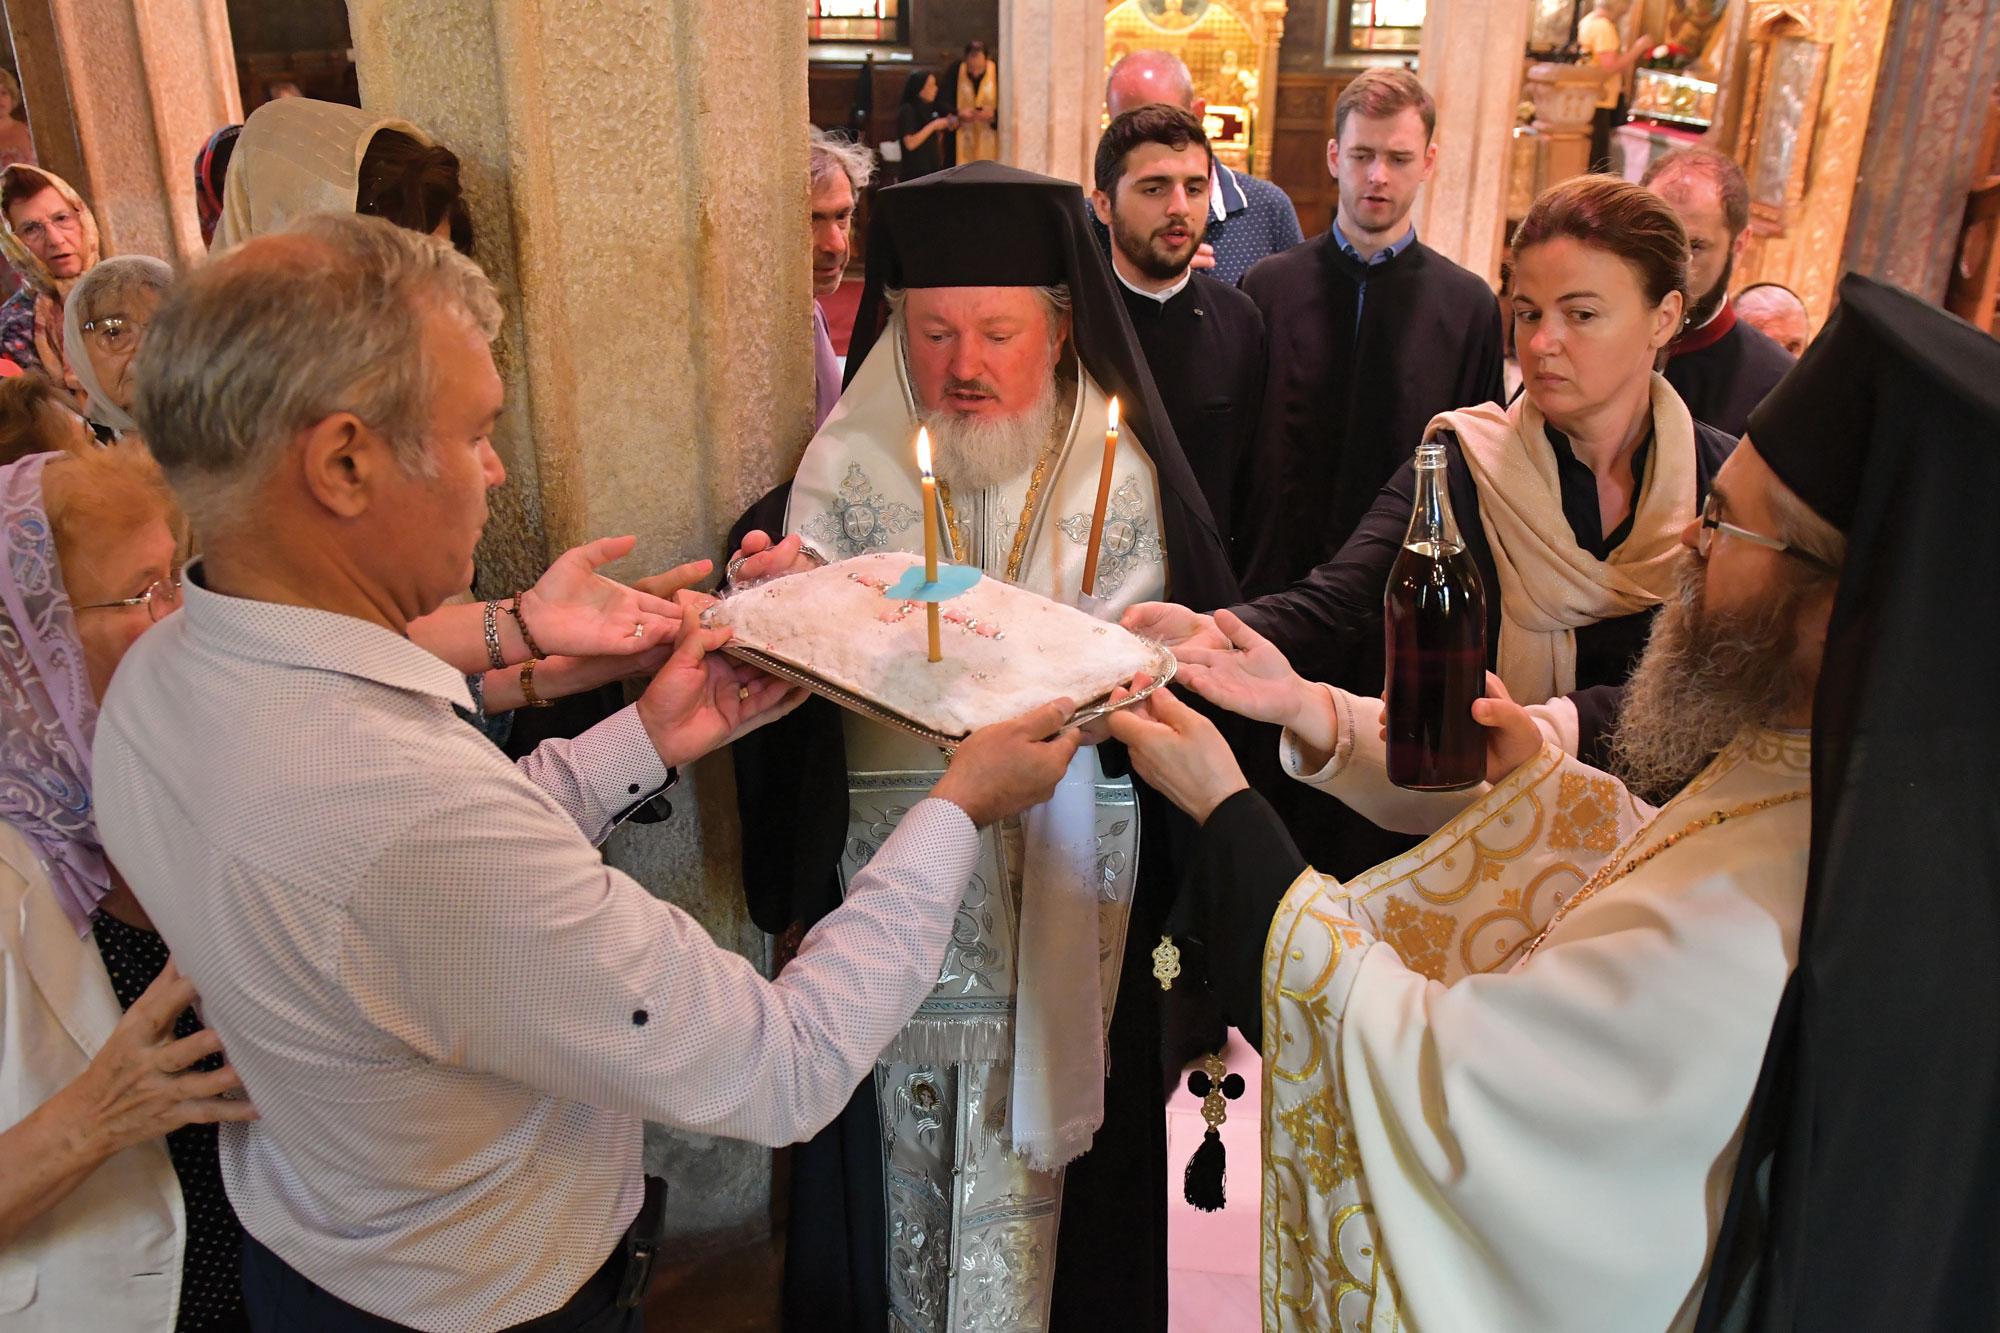 Slujbă de pomenire pentru Patriarhii Iustin și Teoctist